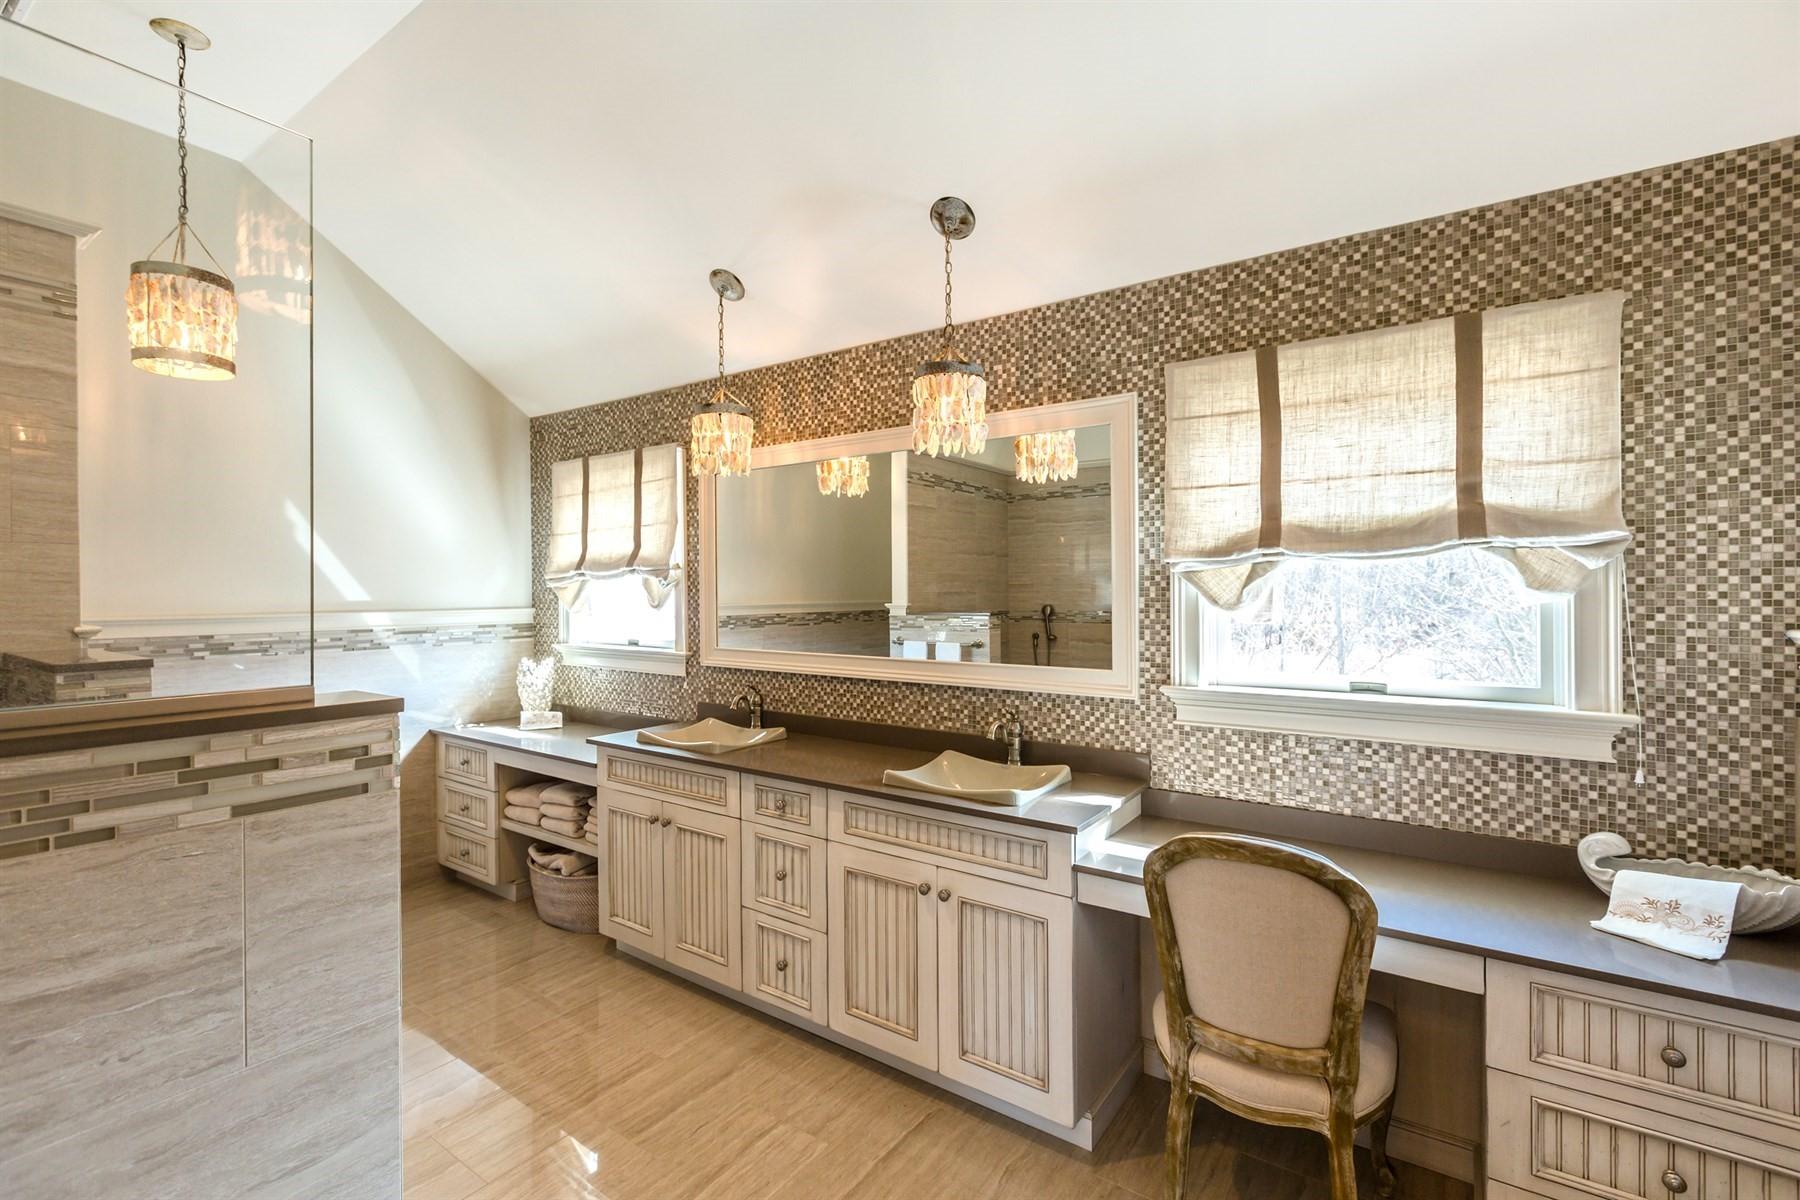 Additional photo for property listing at Aquebogue 267 Peconic Bay Blvd Aquebogue, New York 11931 United States